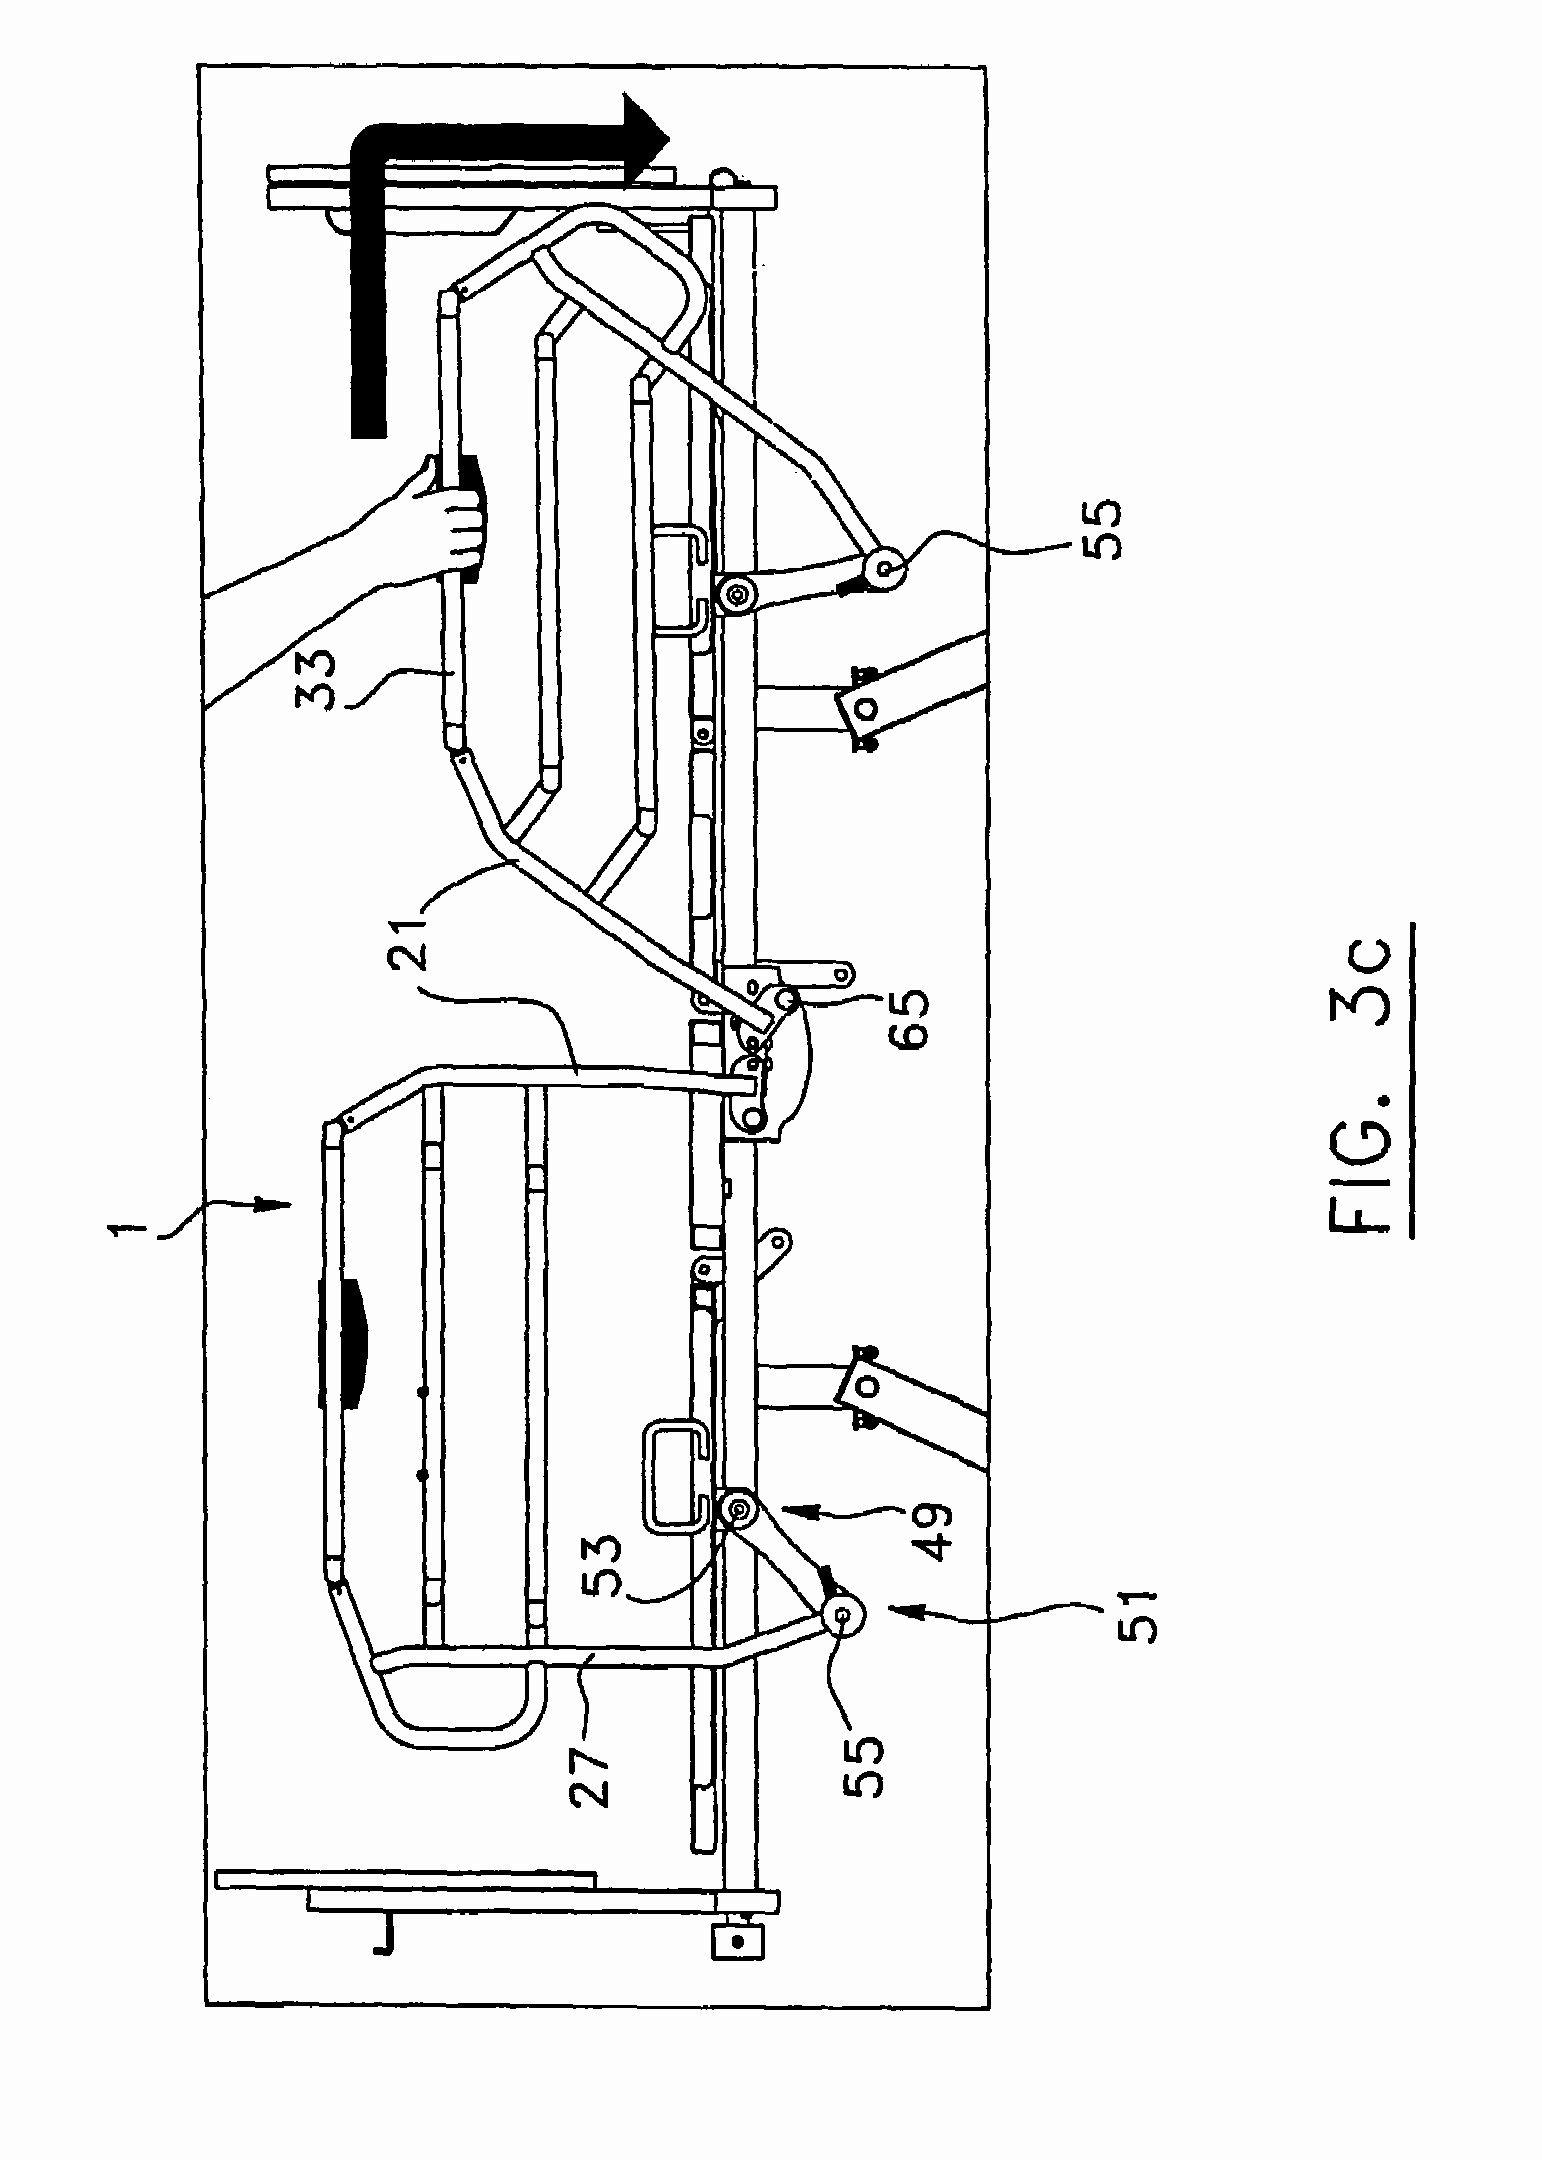 gm alternator wiring diagram re